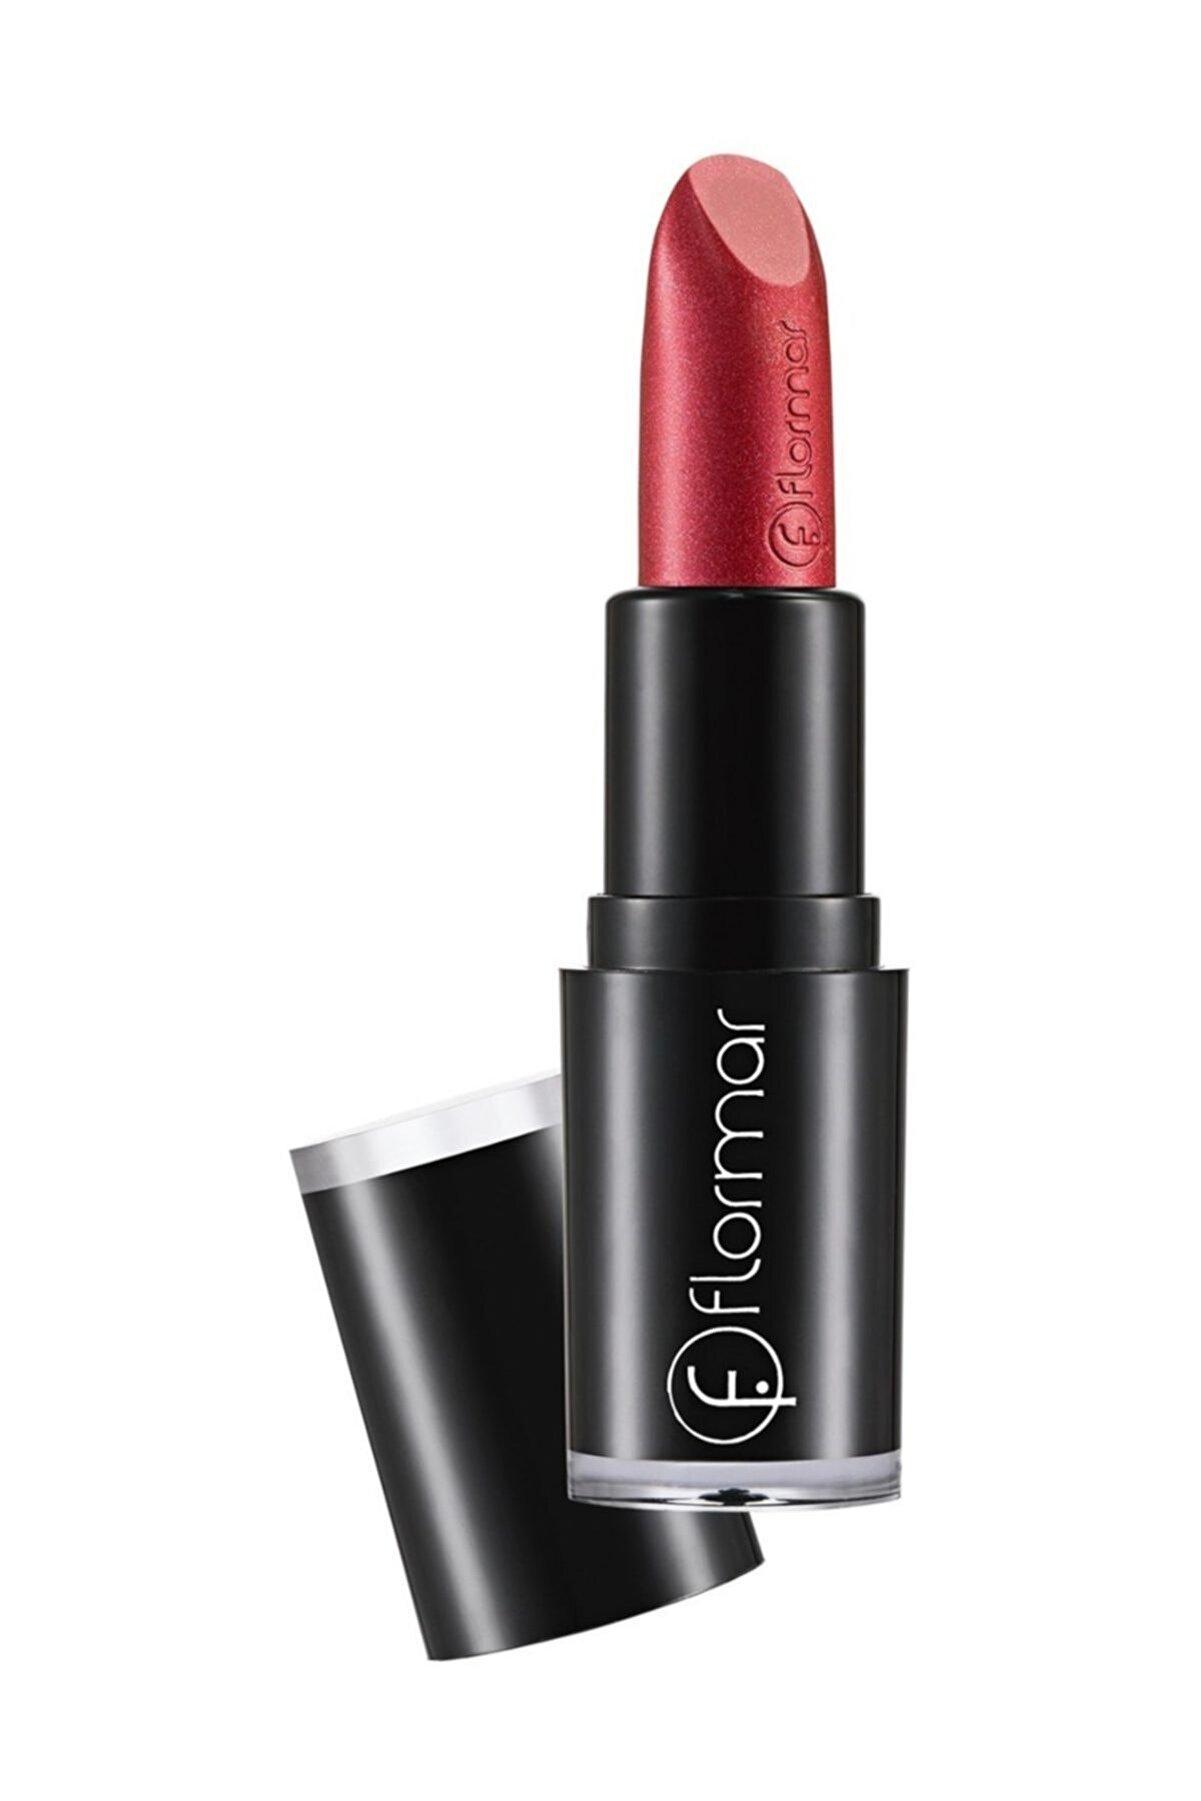 Flormar Ruj - Long Wearing Lipstick Quite Cute 8690604138357